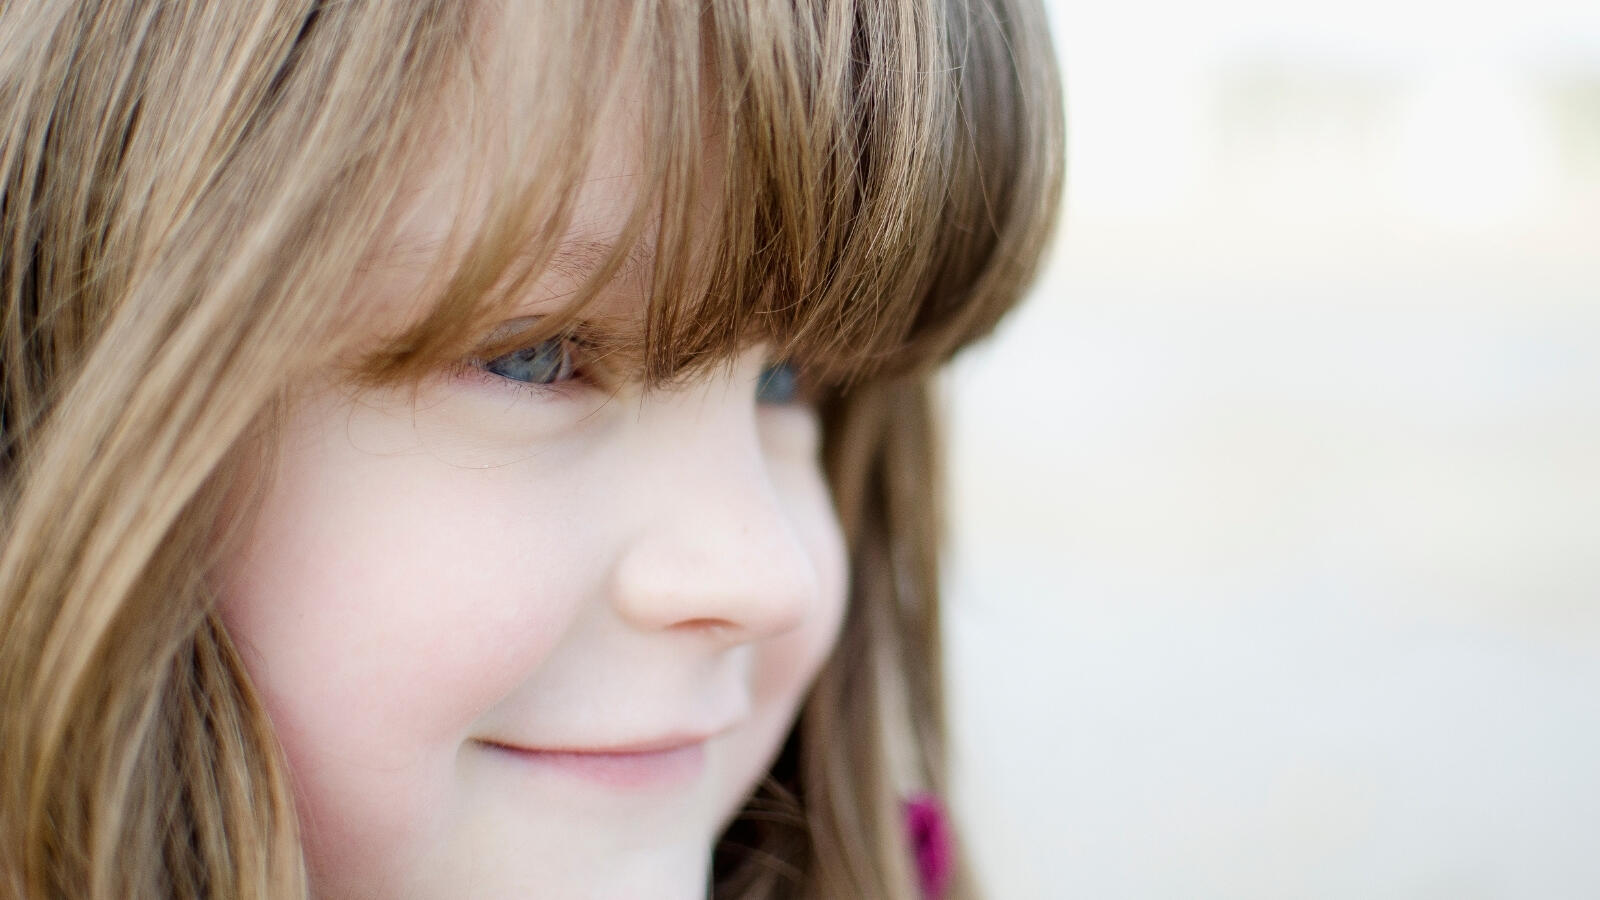 How to help raise an optimistic child